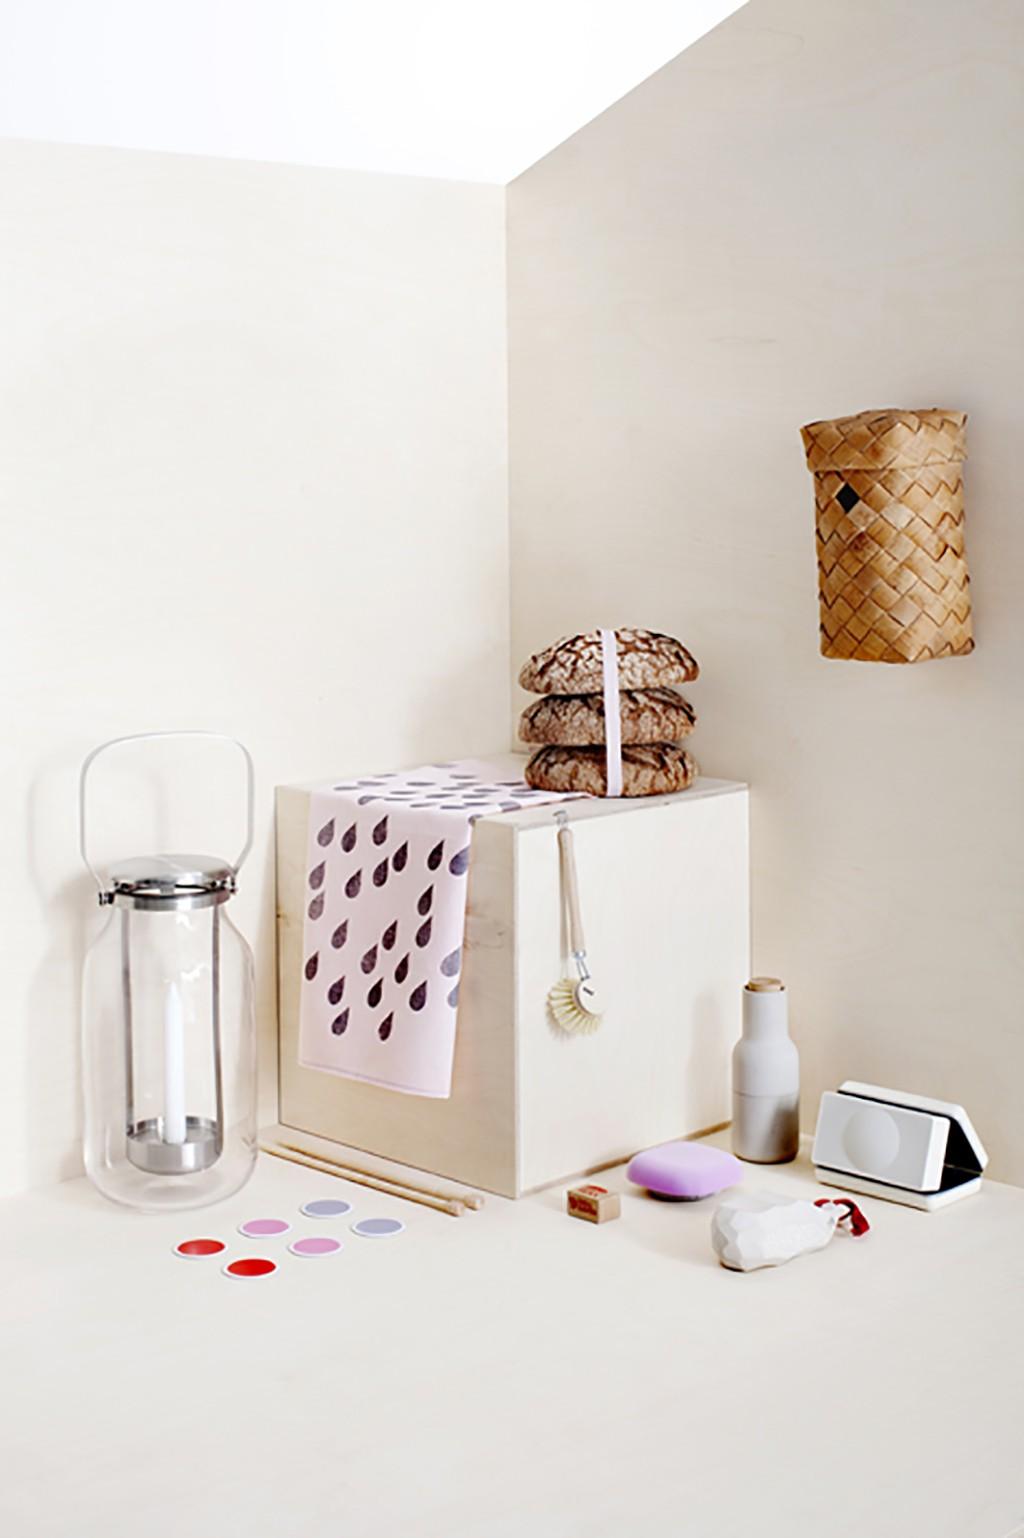 Summer souvenirs for Deko-magazine by Susanna Vento